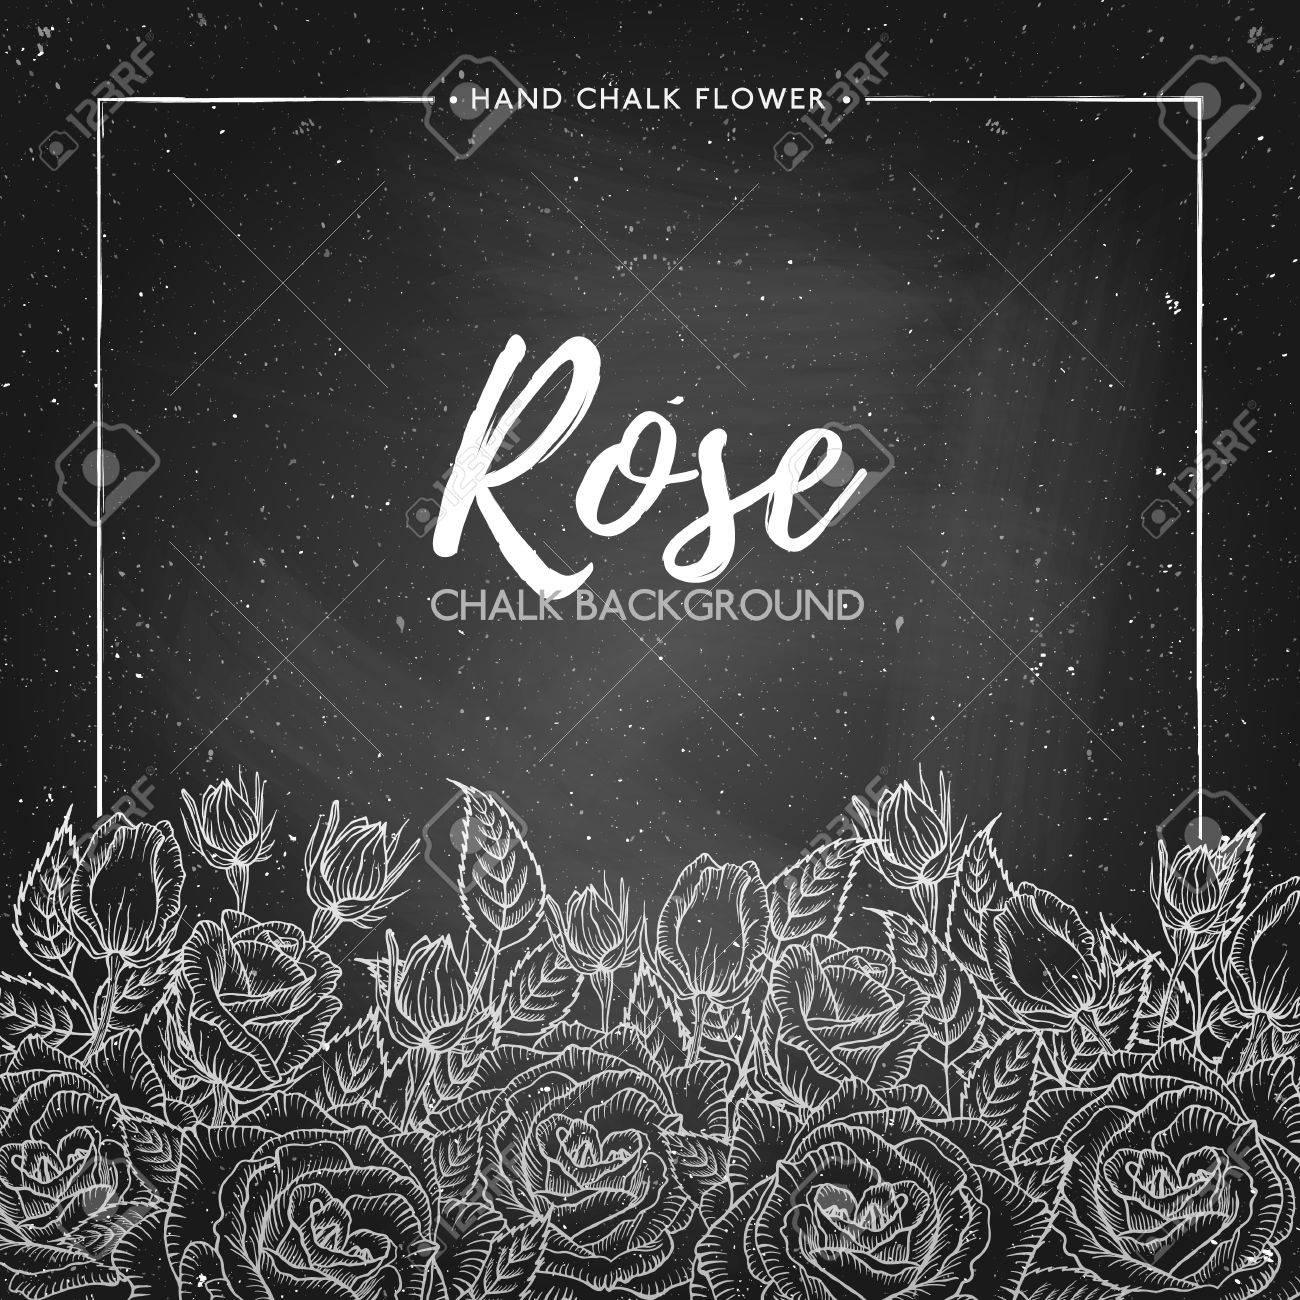 Rosa De Fondo Floral En La Pizarra, La Tiza Marco De La Flor, Floral ...